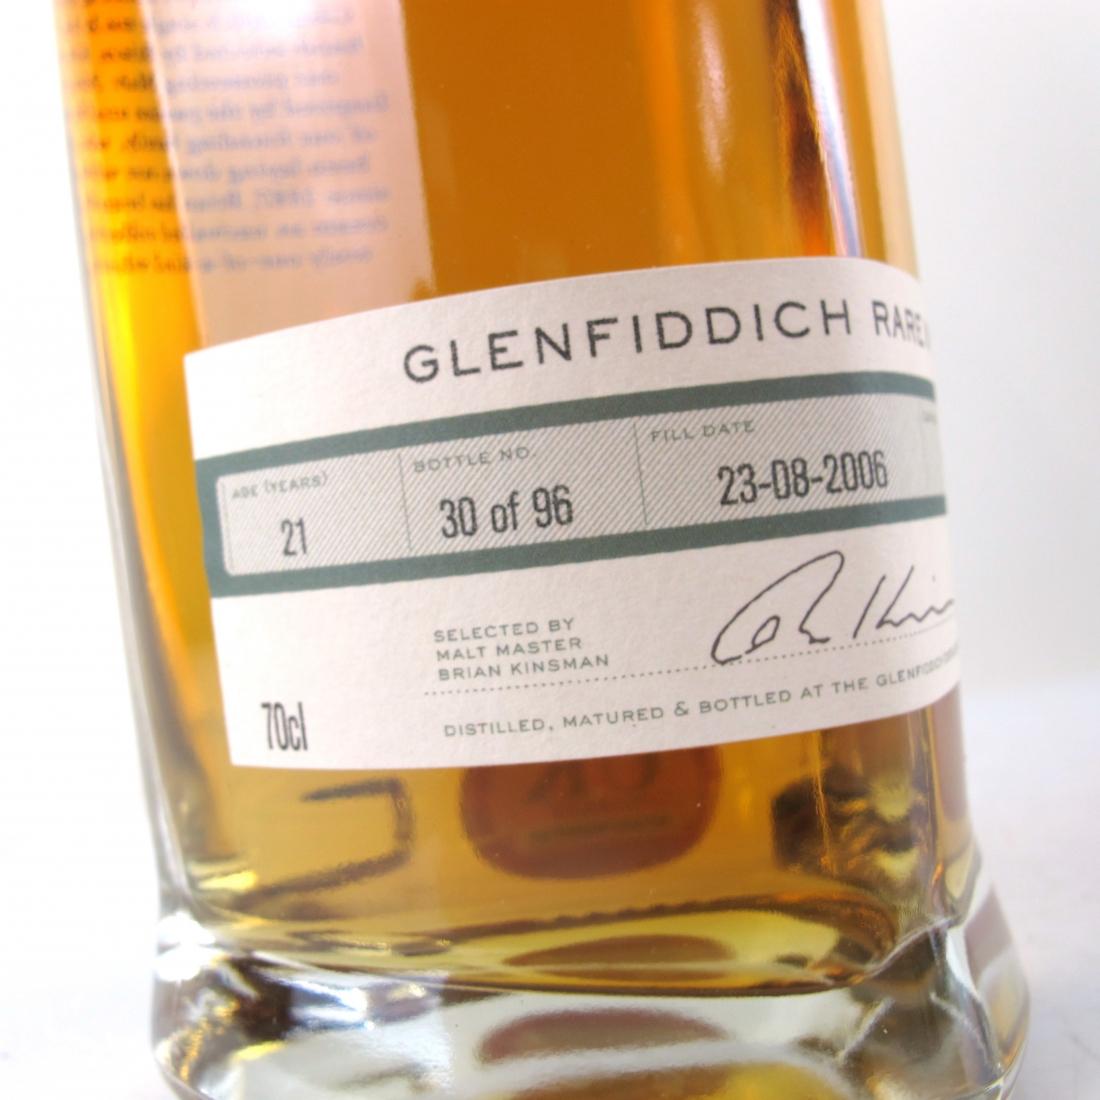 Glenfiddich 21 Year Old Rare Cask #11